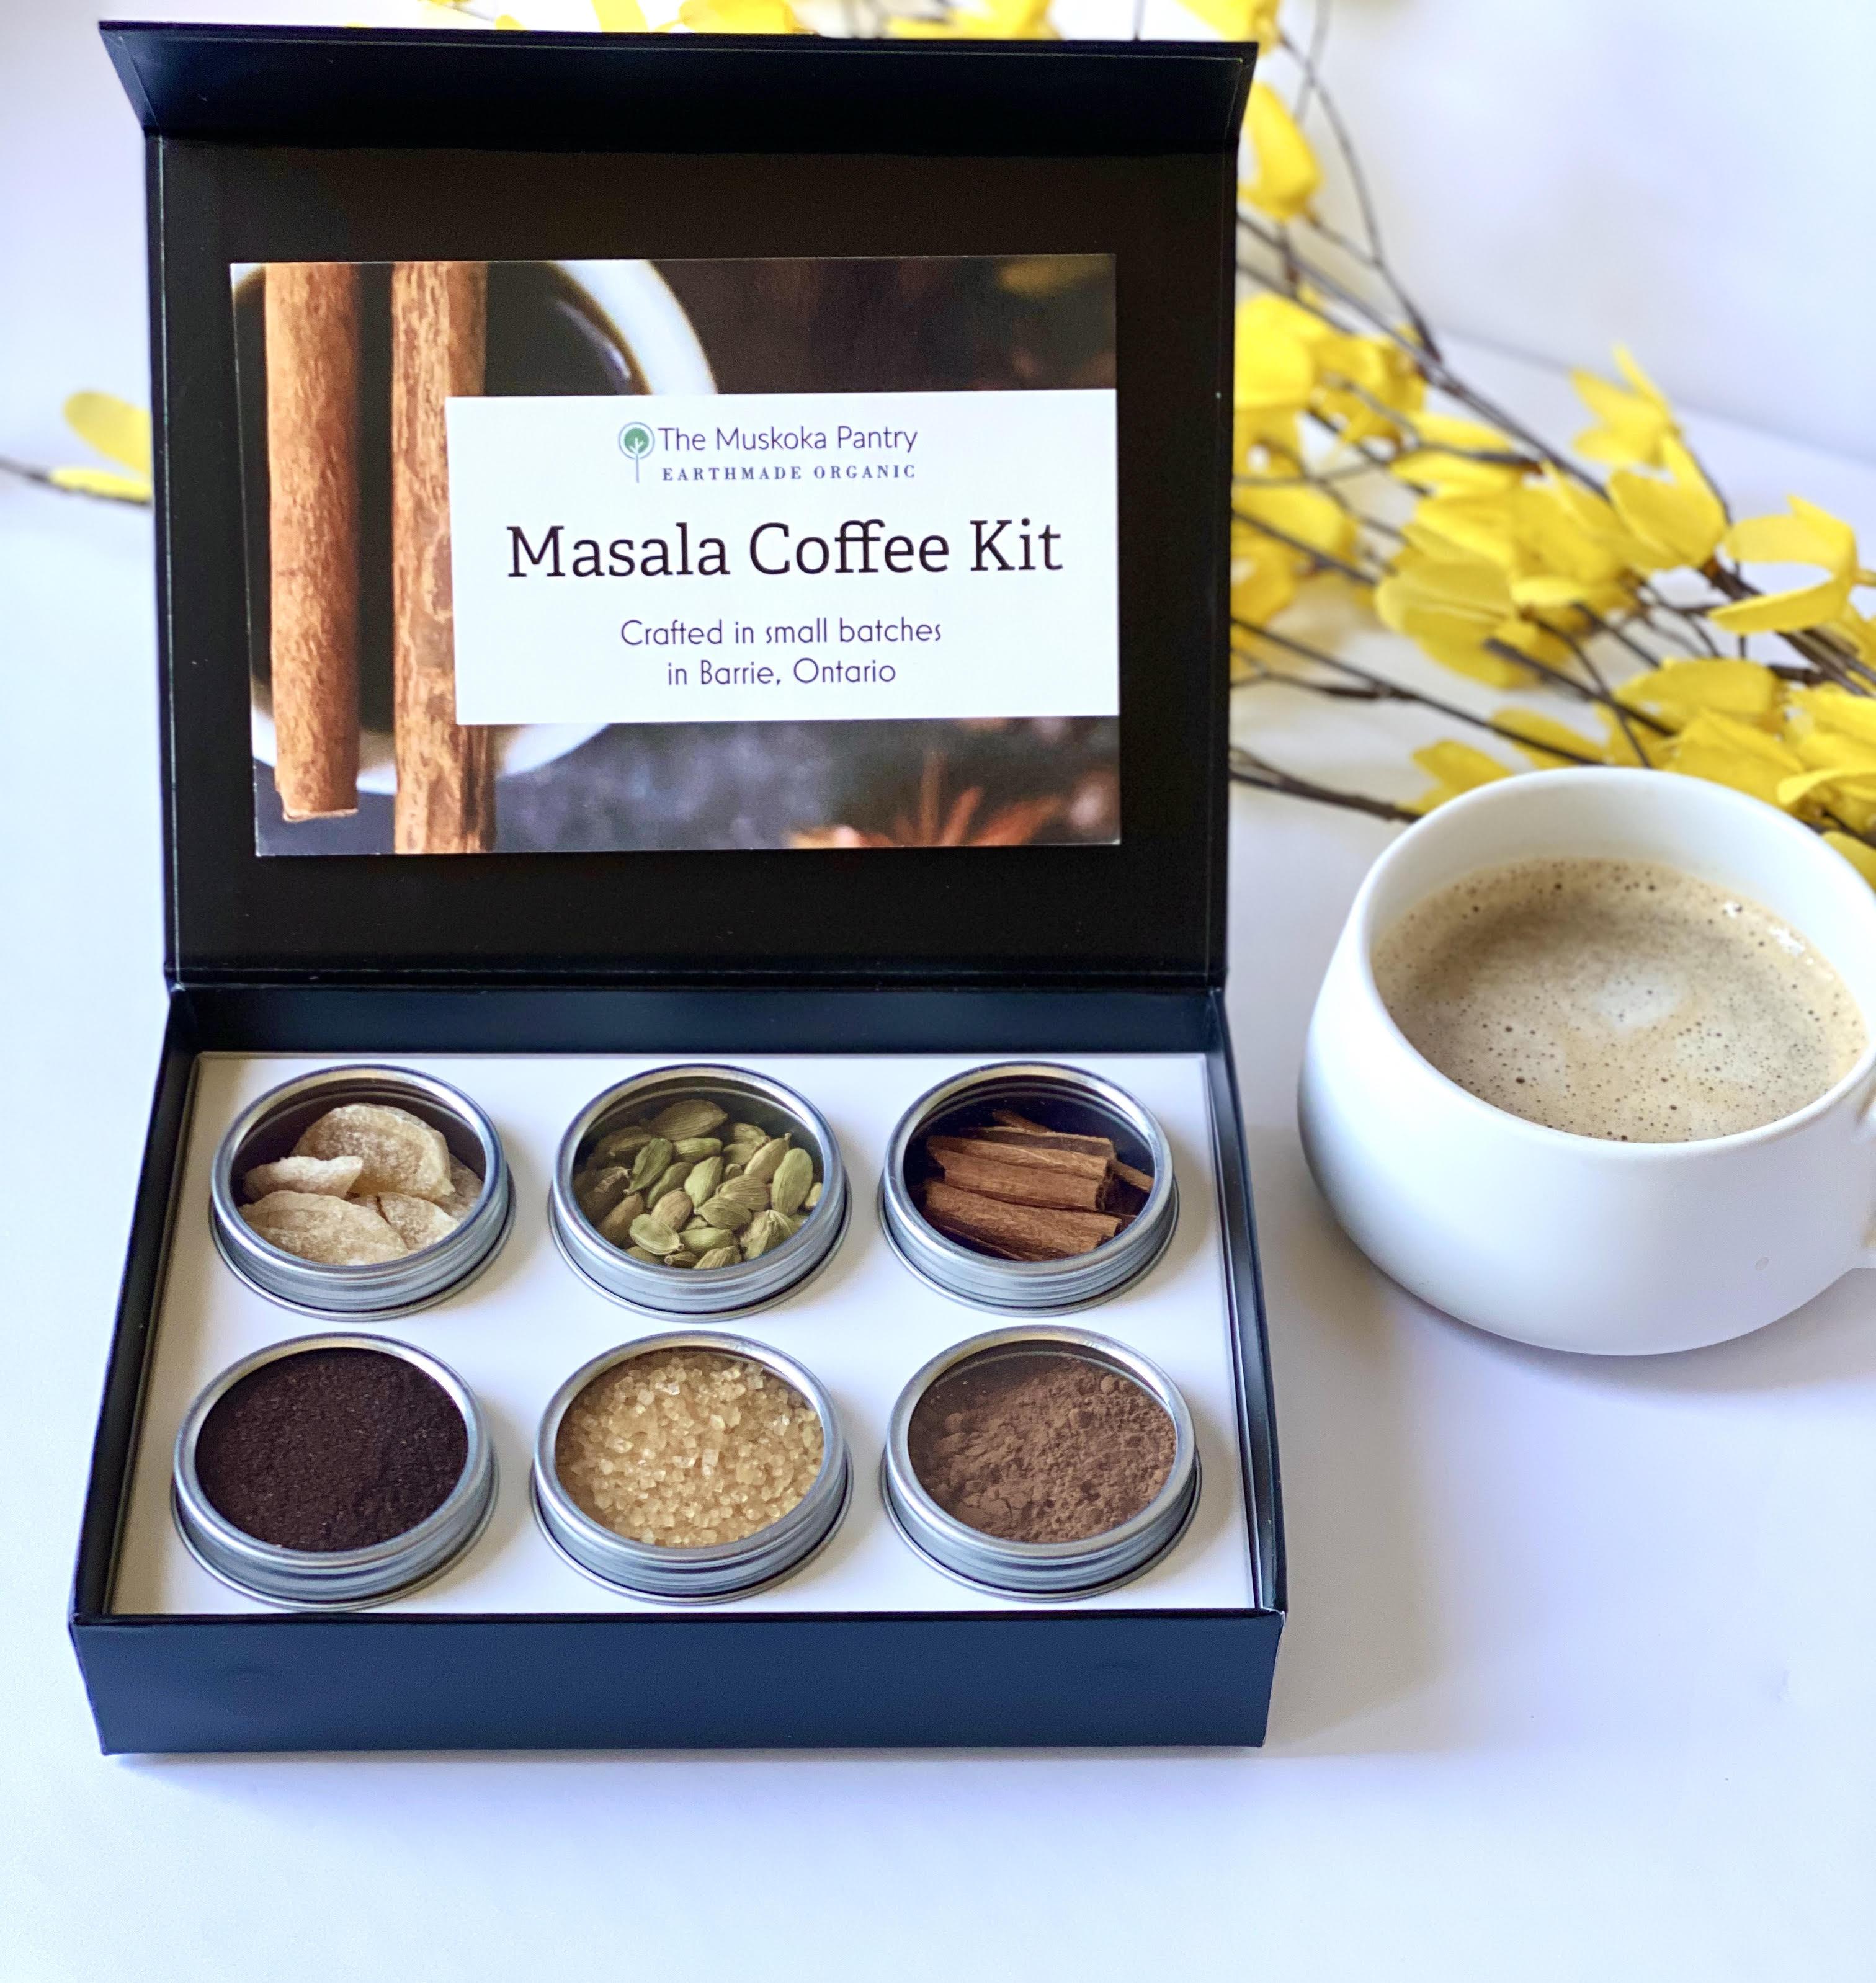 Masala coffee kit